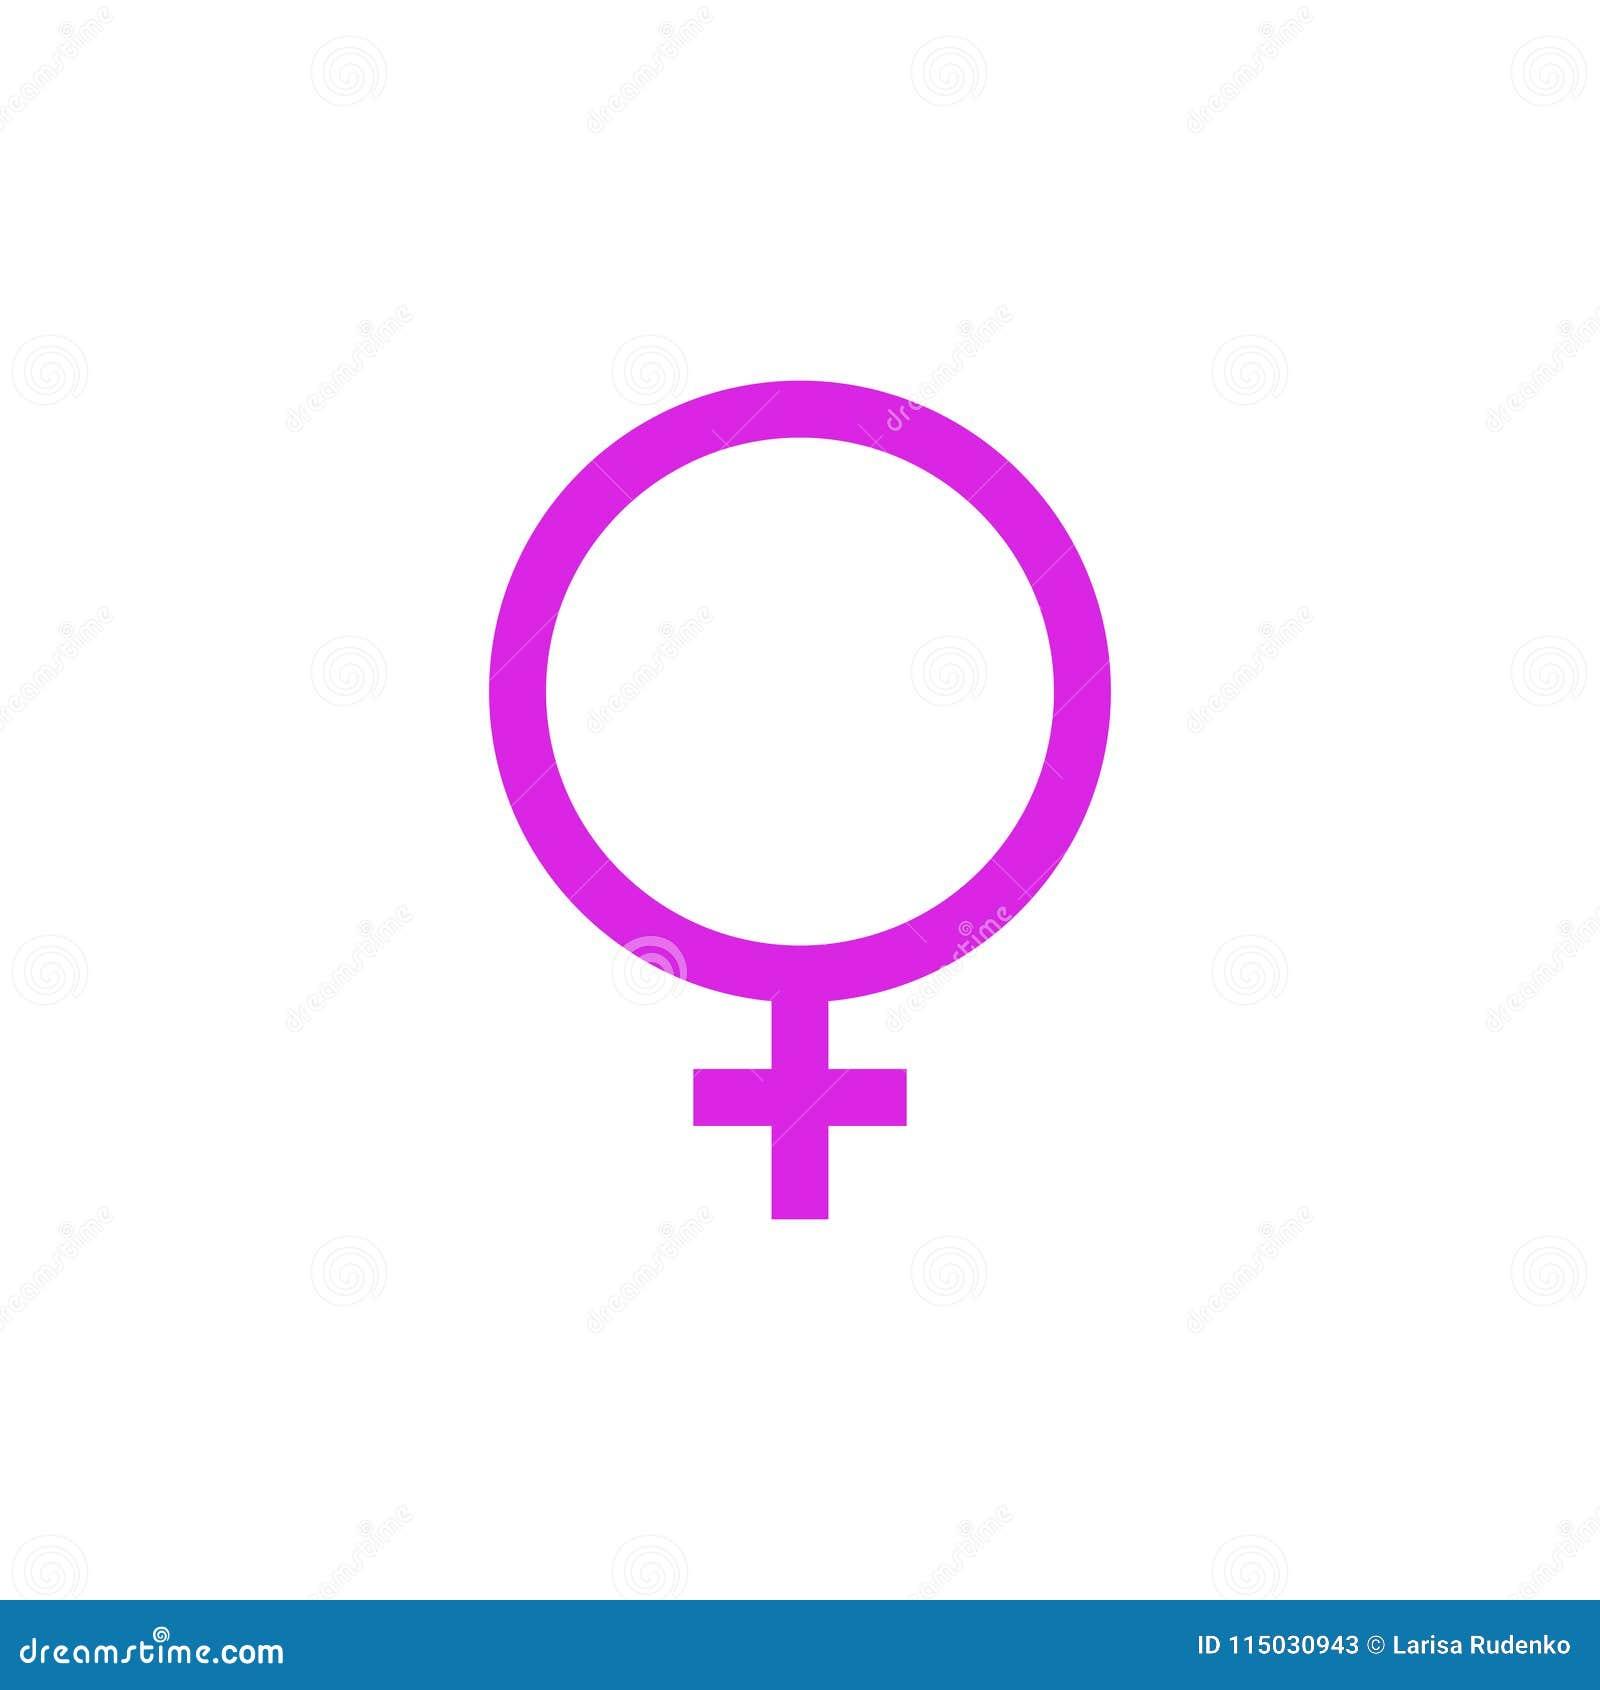 symbols that represent equality